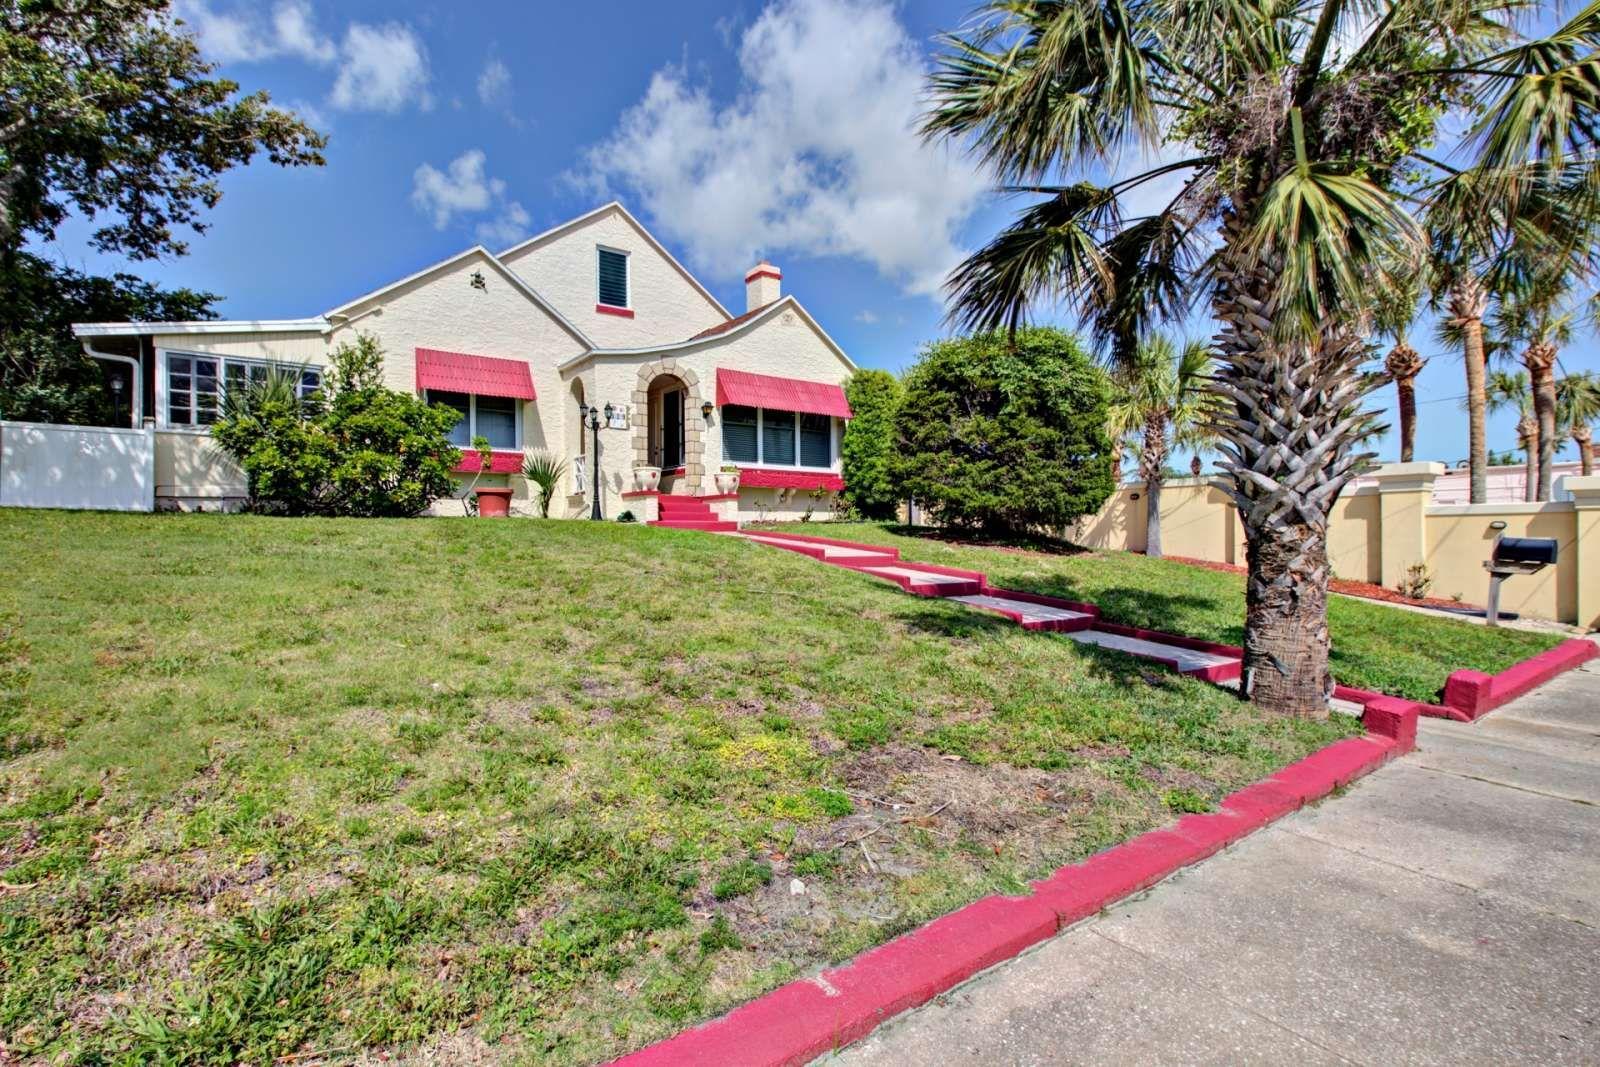 Daytona Beach Vacation Rental New Listing Charming 1920 S Home 5 Mins To Main St Vacation Home Rentals Pet Friendly Vacation Rentals Beach Vacation Rentals